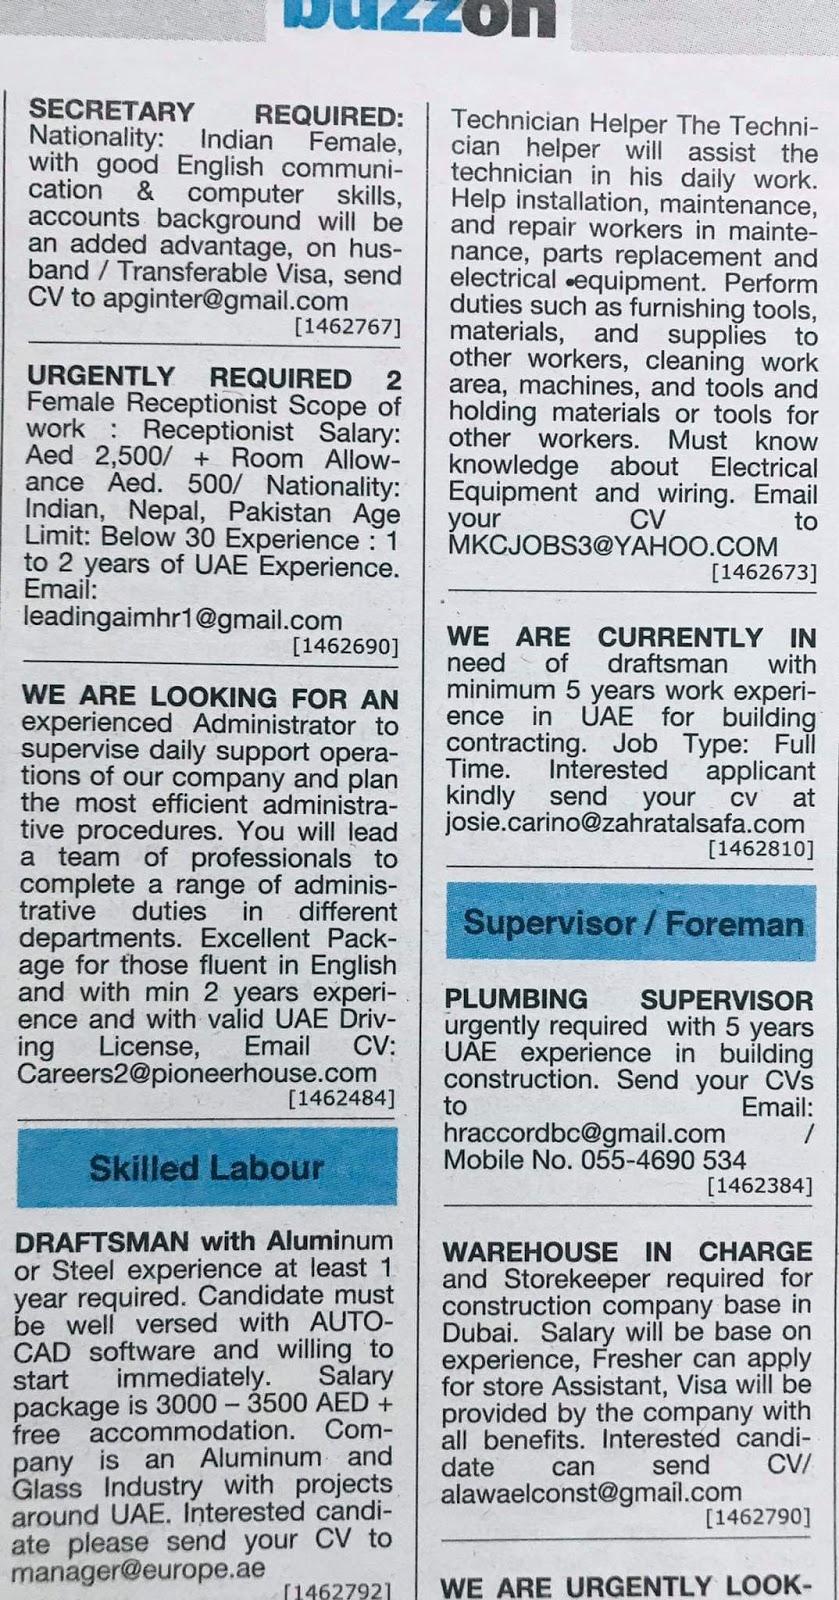 khaleej times jobs 12/12/2018 - وظائف شاغرة فى الامارات